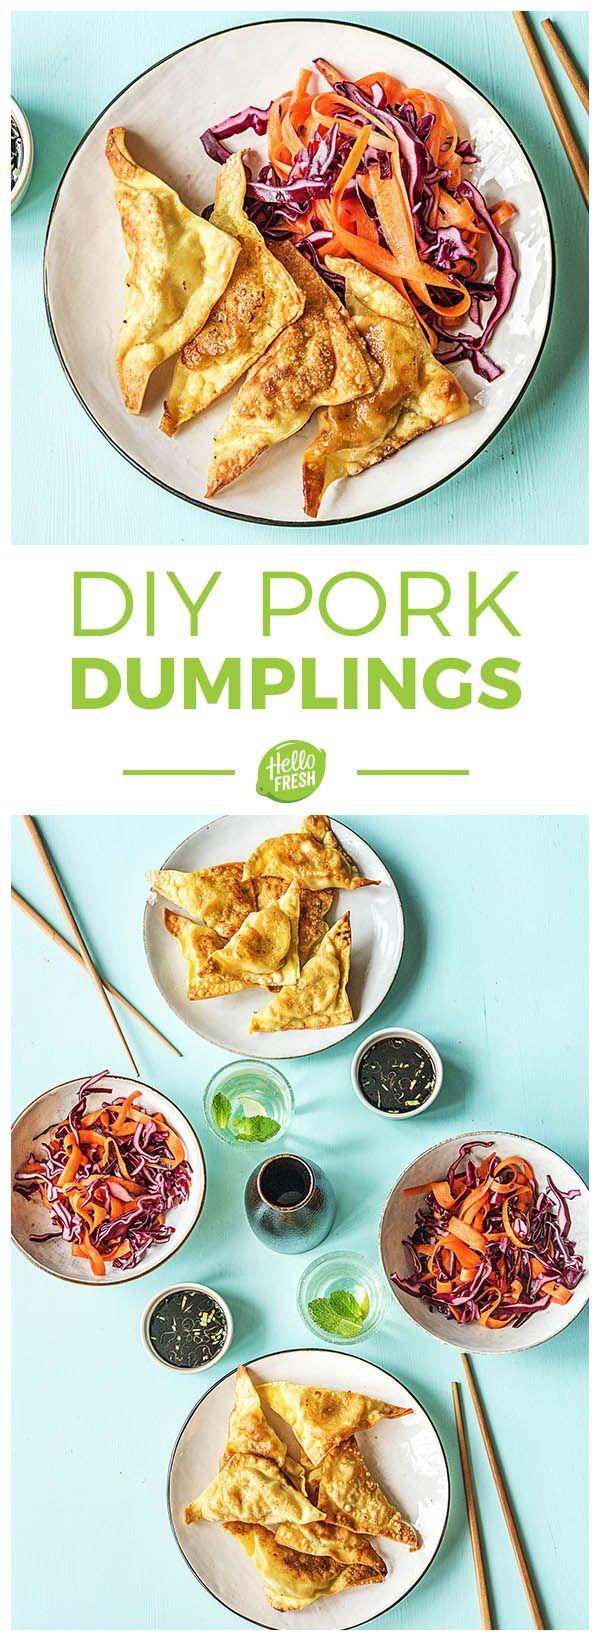 DIY asian-inspired porn dumplings | More easy recipes on hellofresh.com